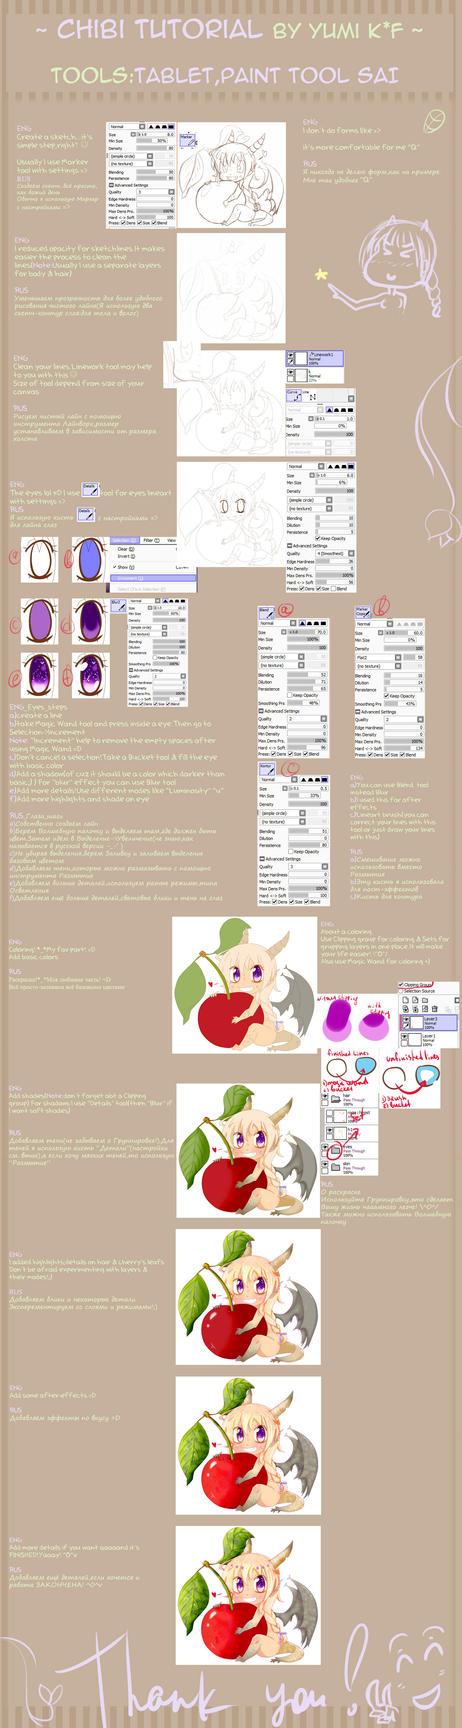 chibi tutorial ENG/RUS by YumiKF